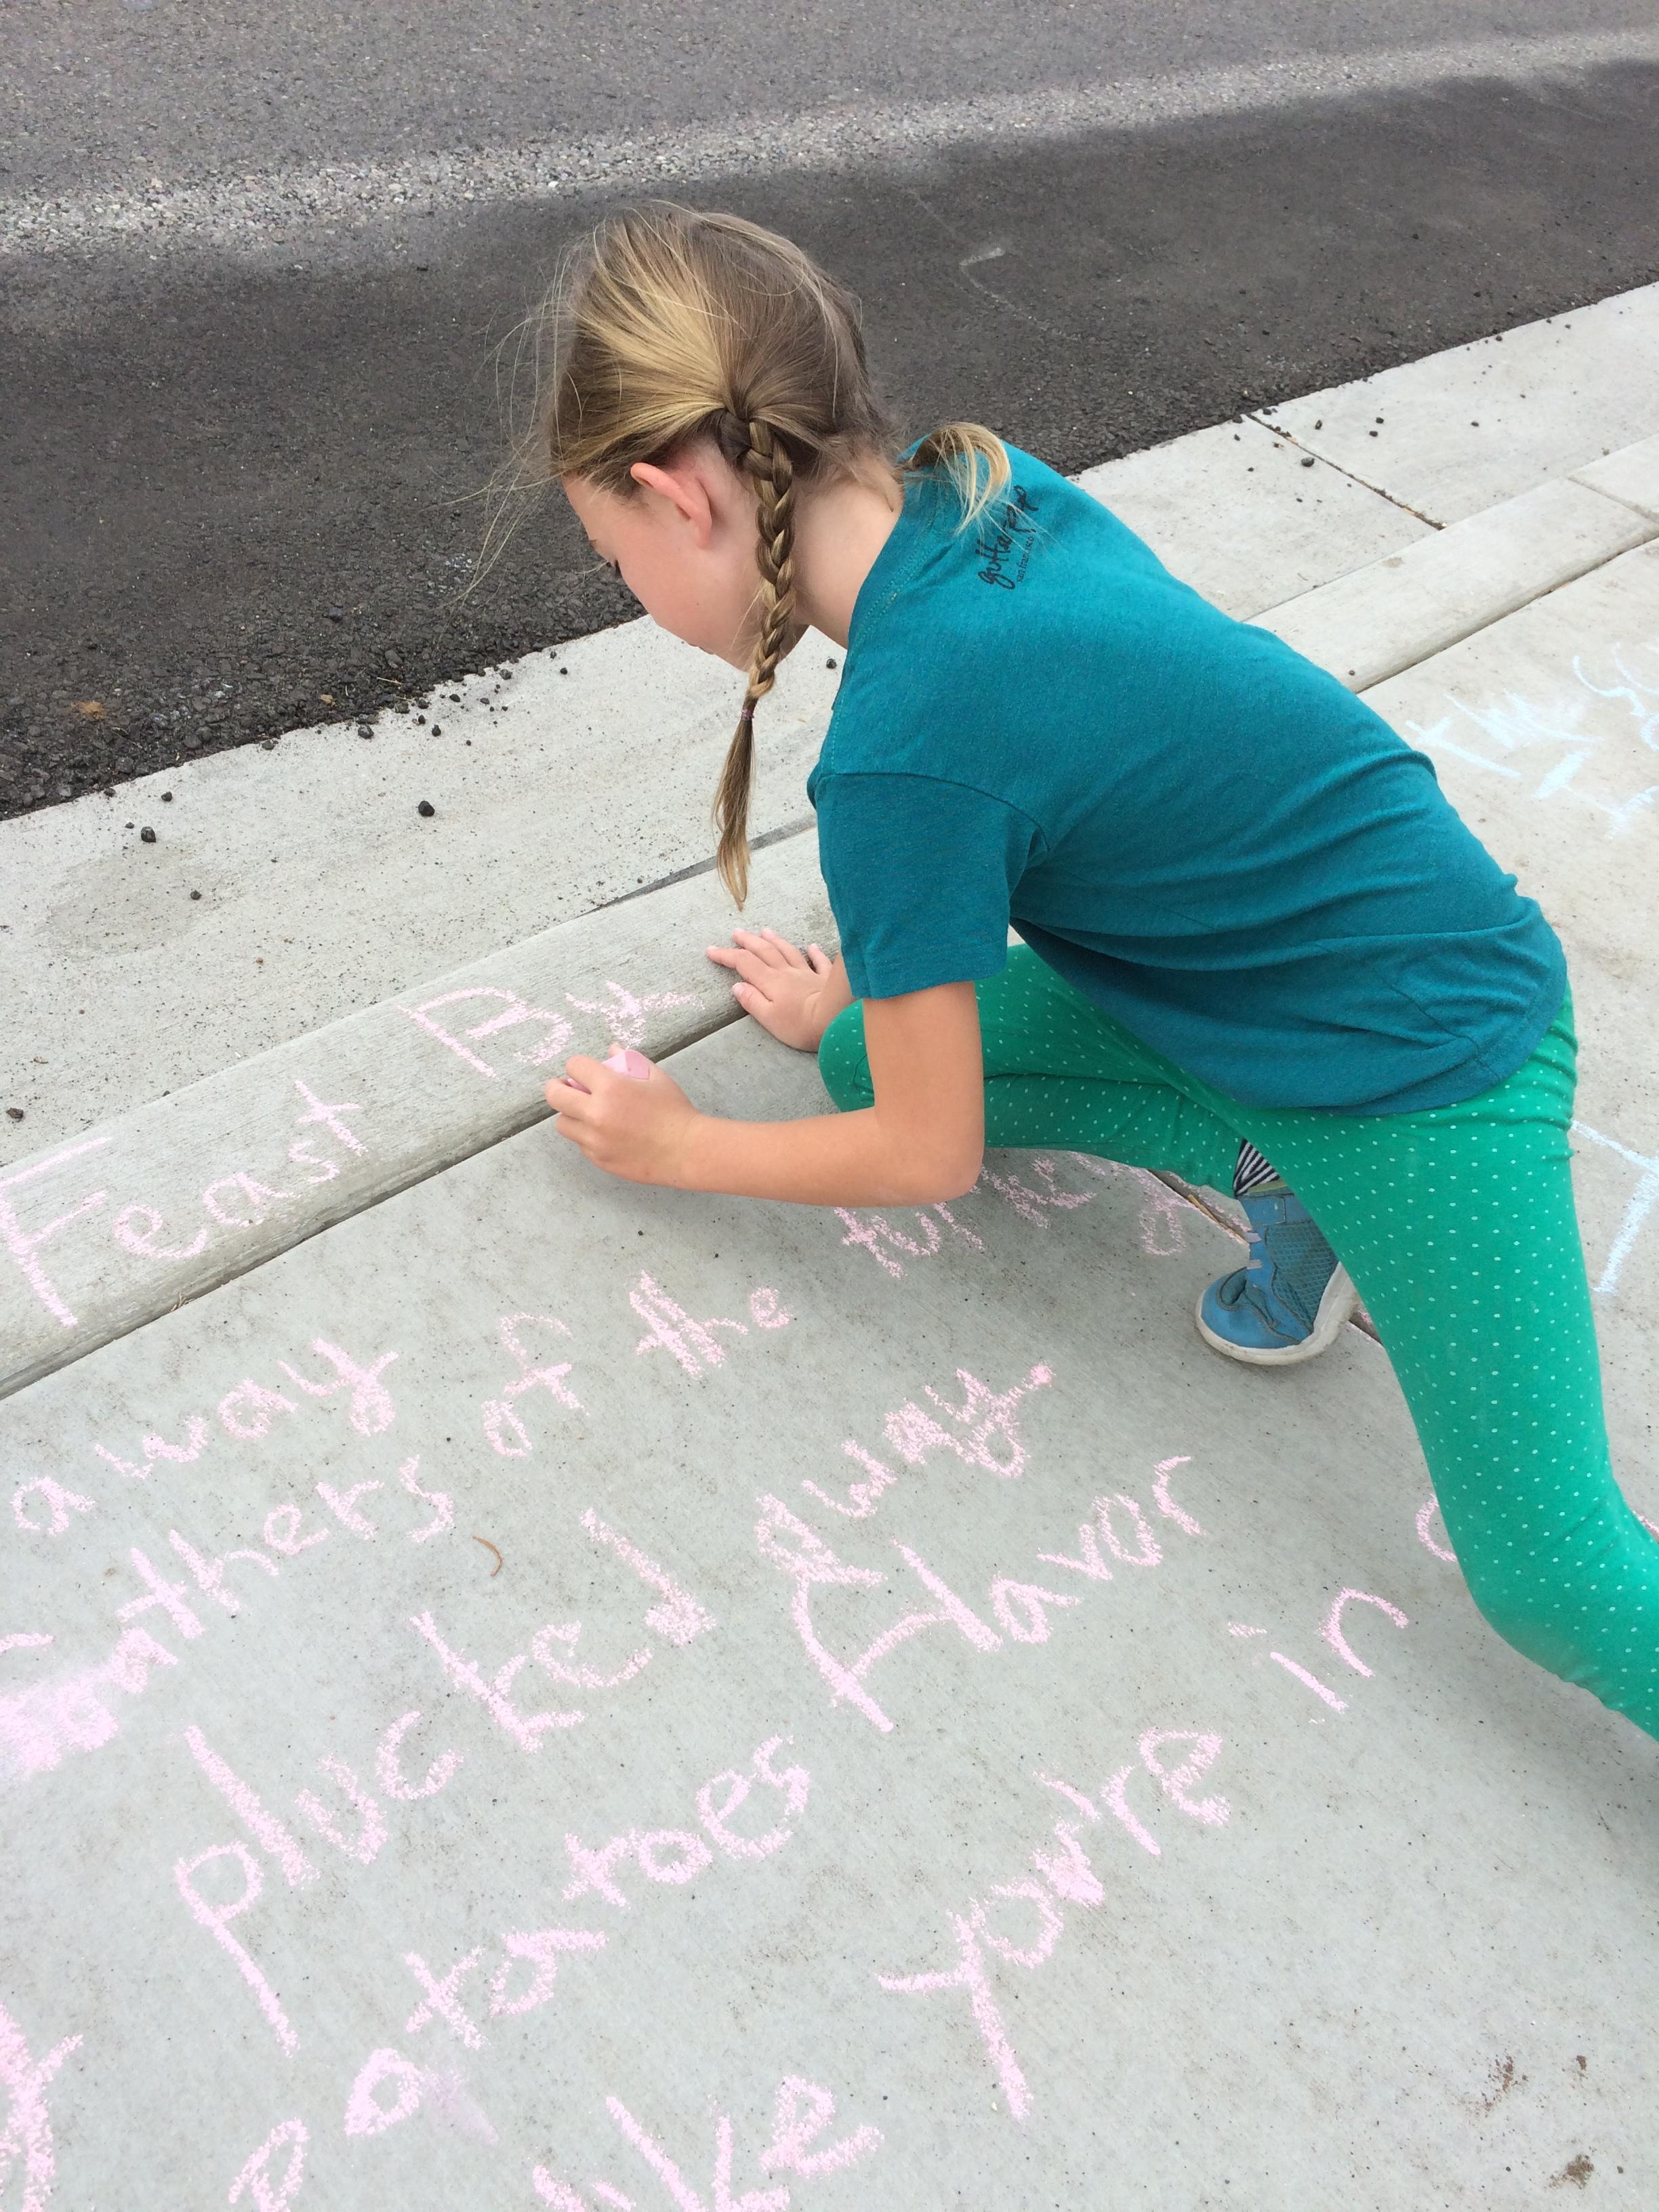 chalking the sidewalk